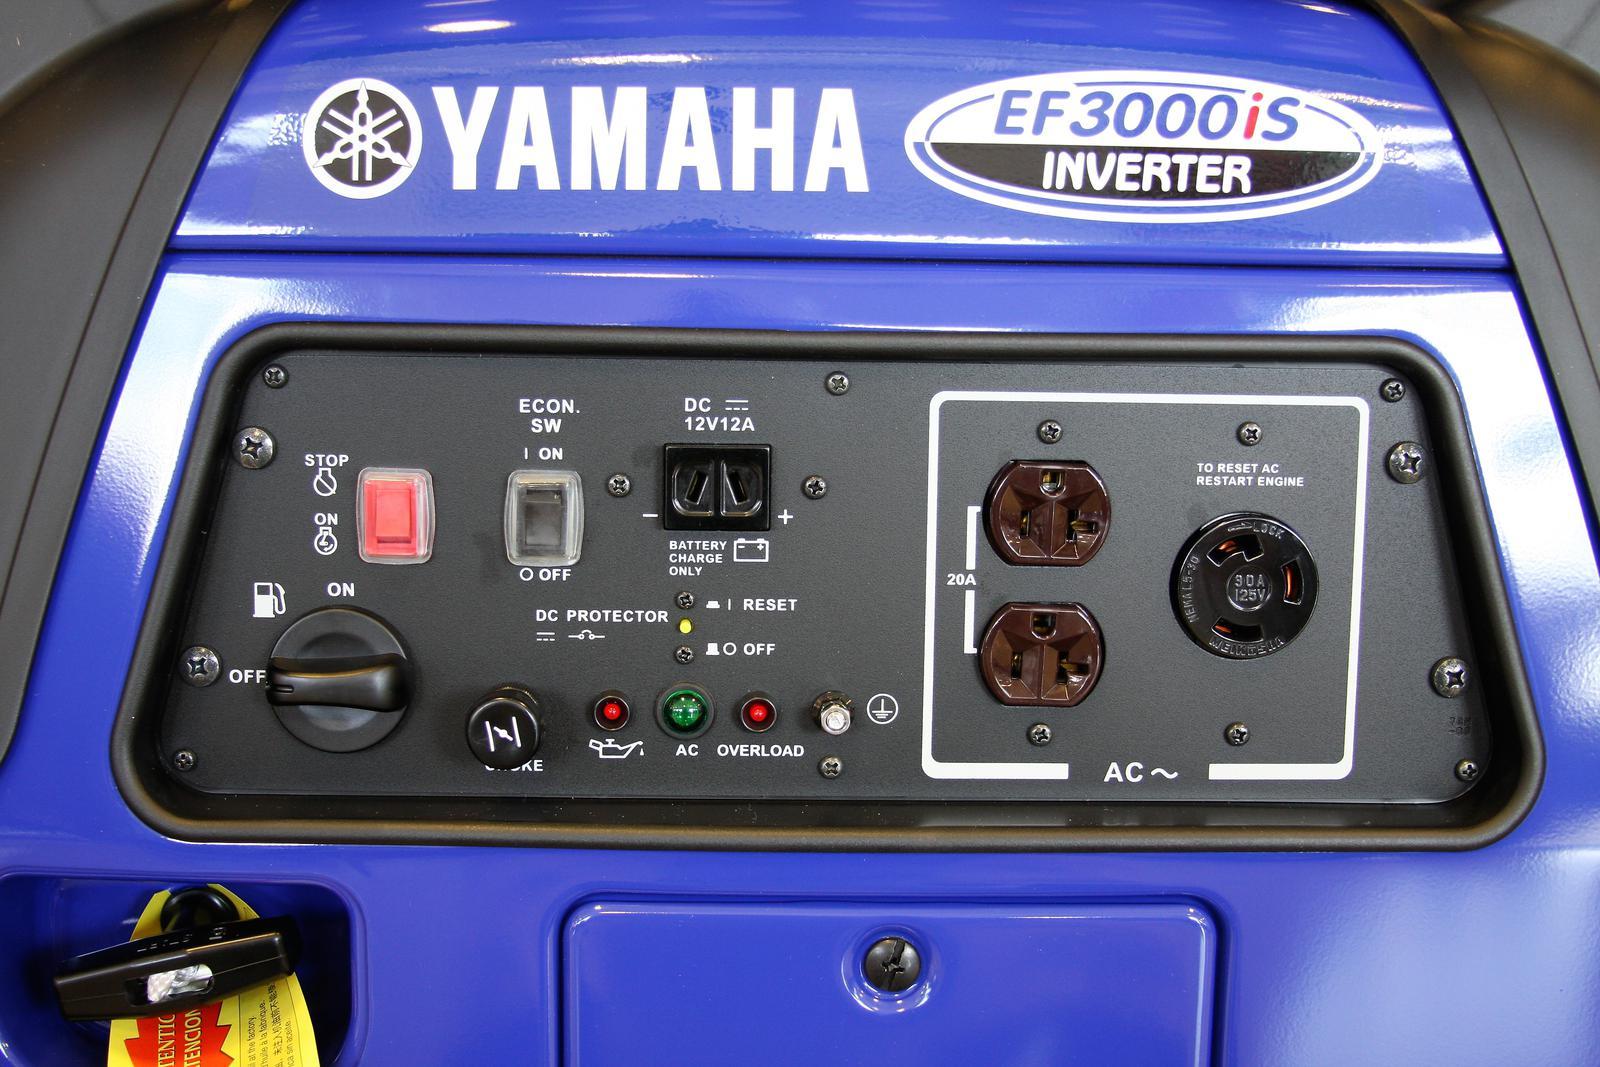 2017 Yamaha EF3000IS